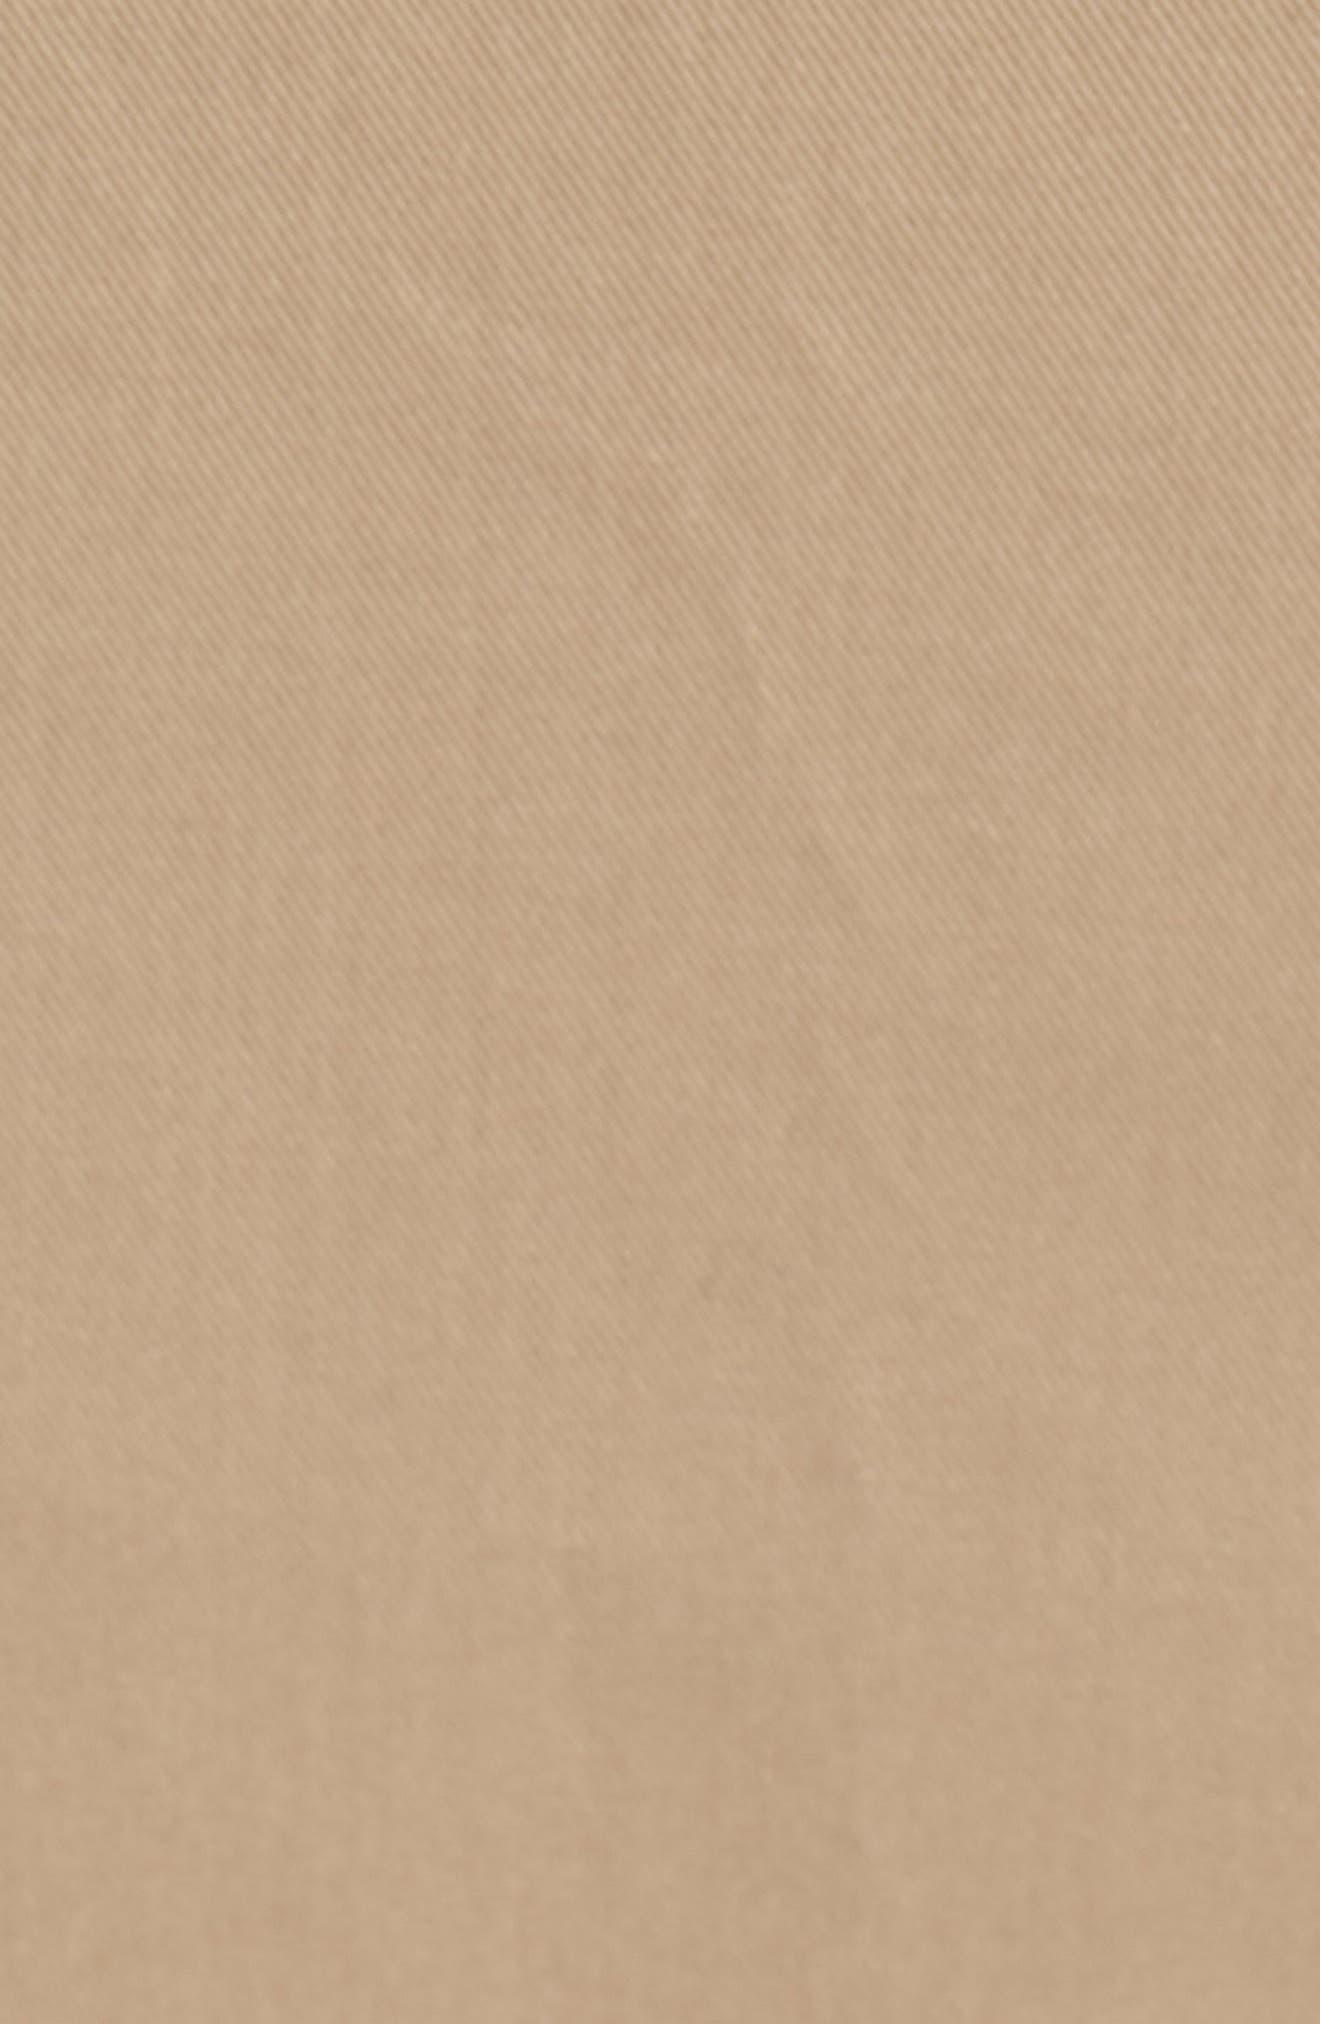 Side Slit Cotton Blend Pencil Skirt,                             Alternate thumbnail 5, color,                             Tan